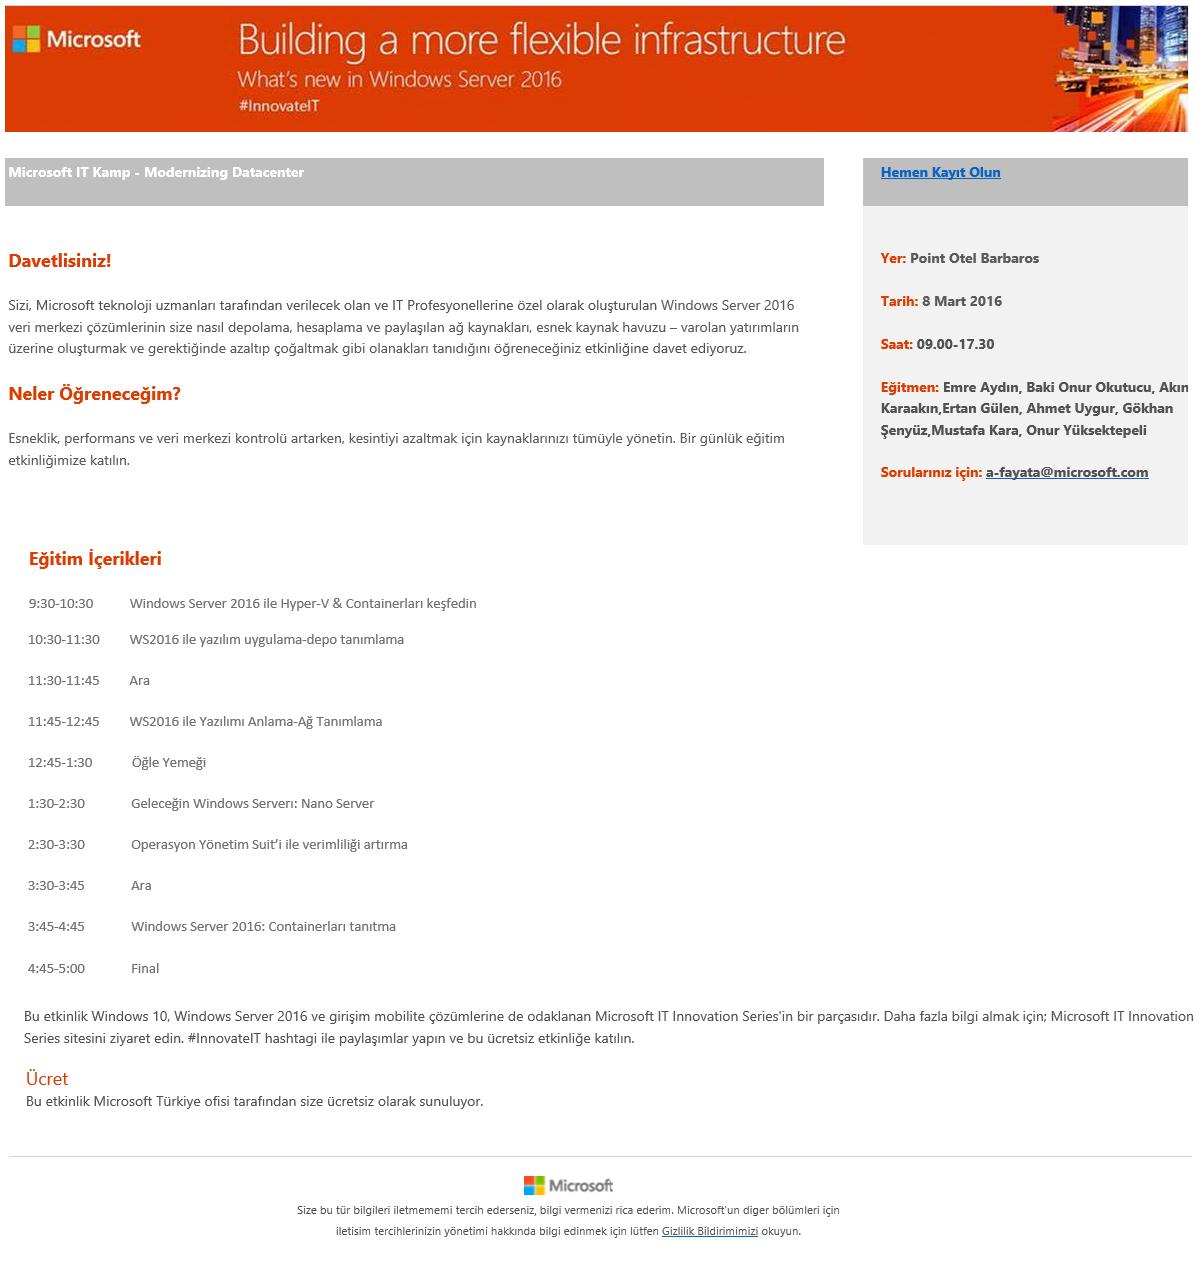 030616_1037_MicrosoftIT1.png